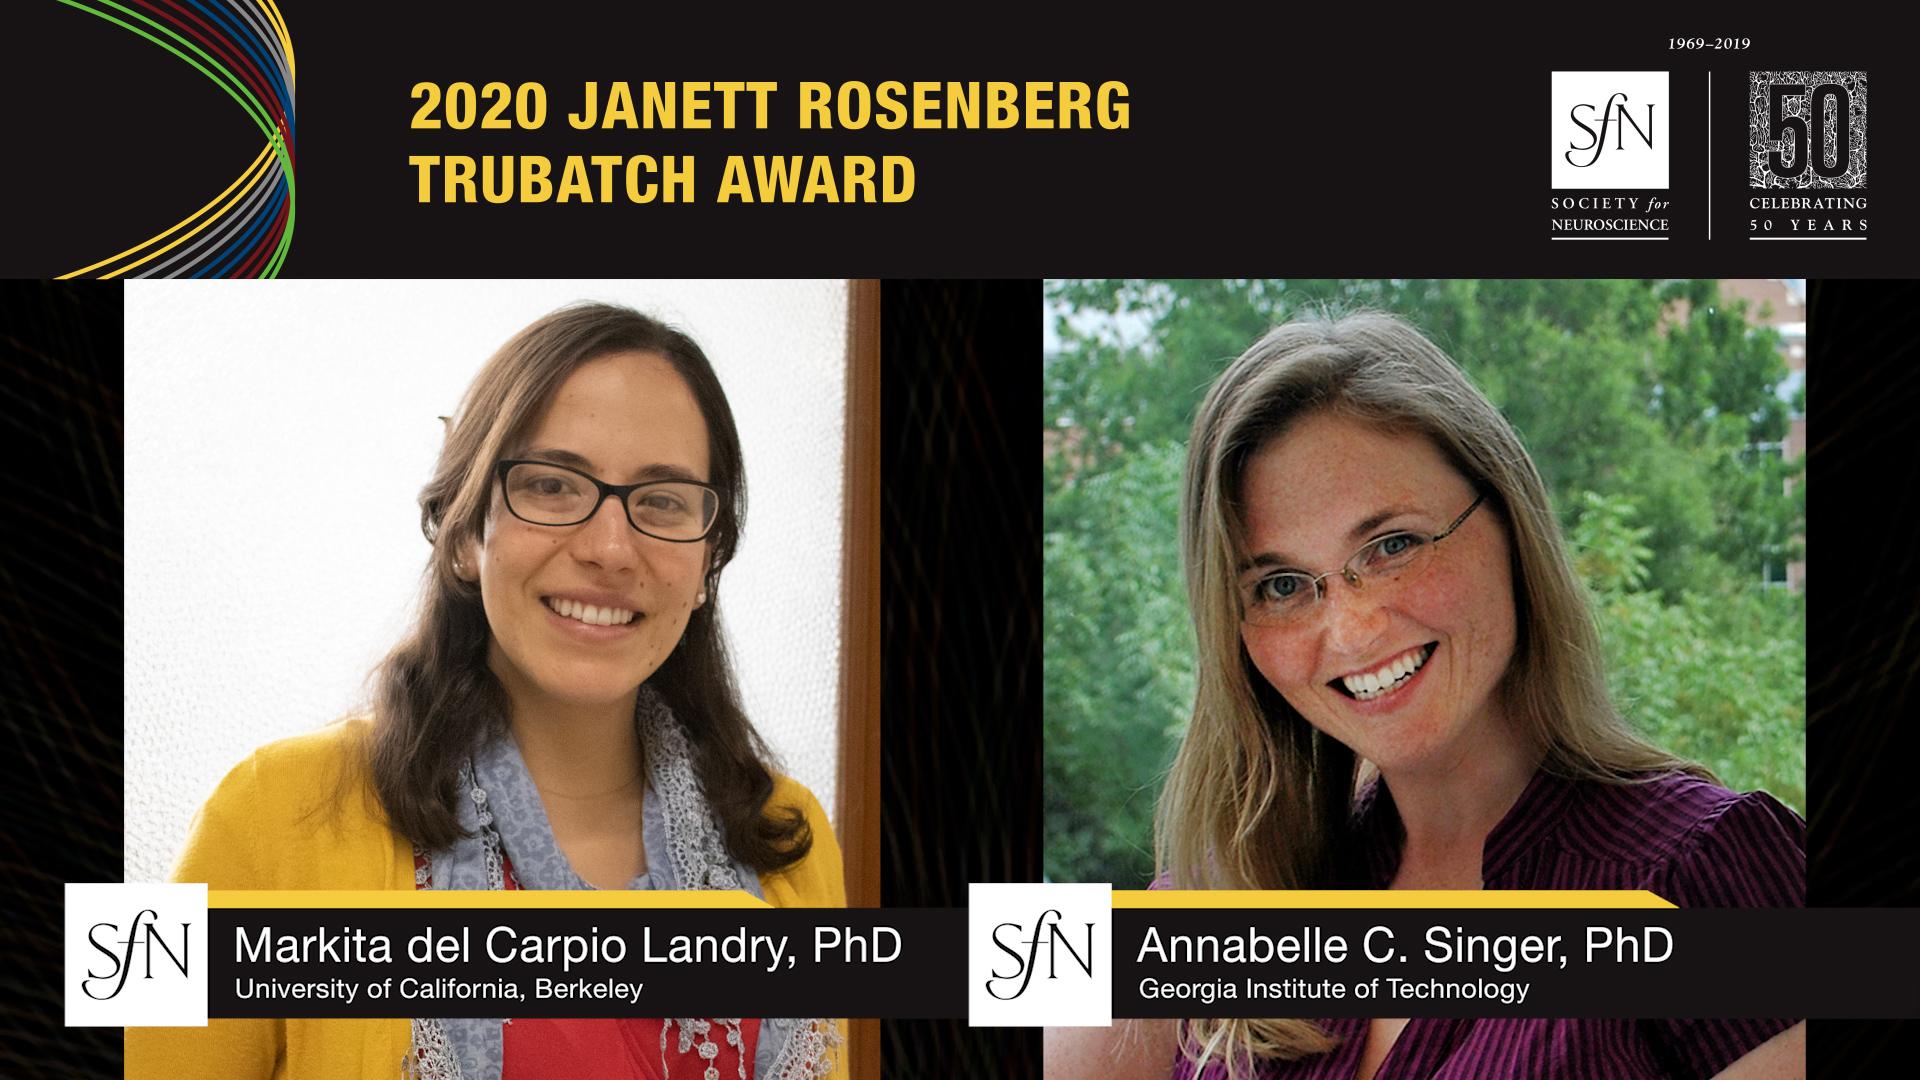 2020 Janett Rosenberg Trubatch Award winners graphic, images of Markita del Carpio Landry, PhD University of California, Berkeley and Annabelle C. Singer, PhD Georgia Institute of Technology